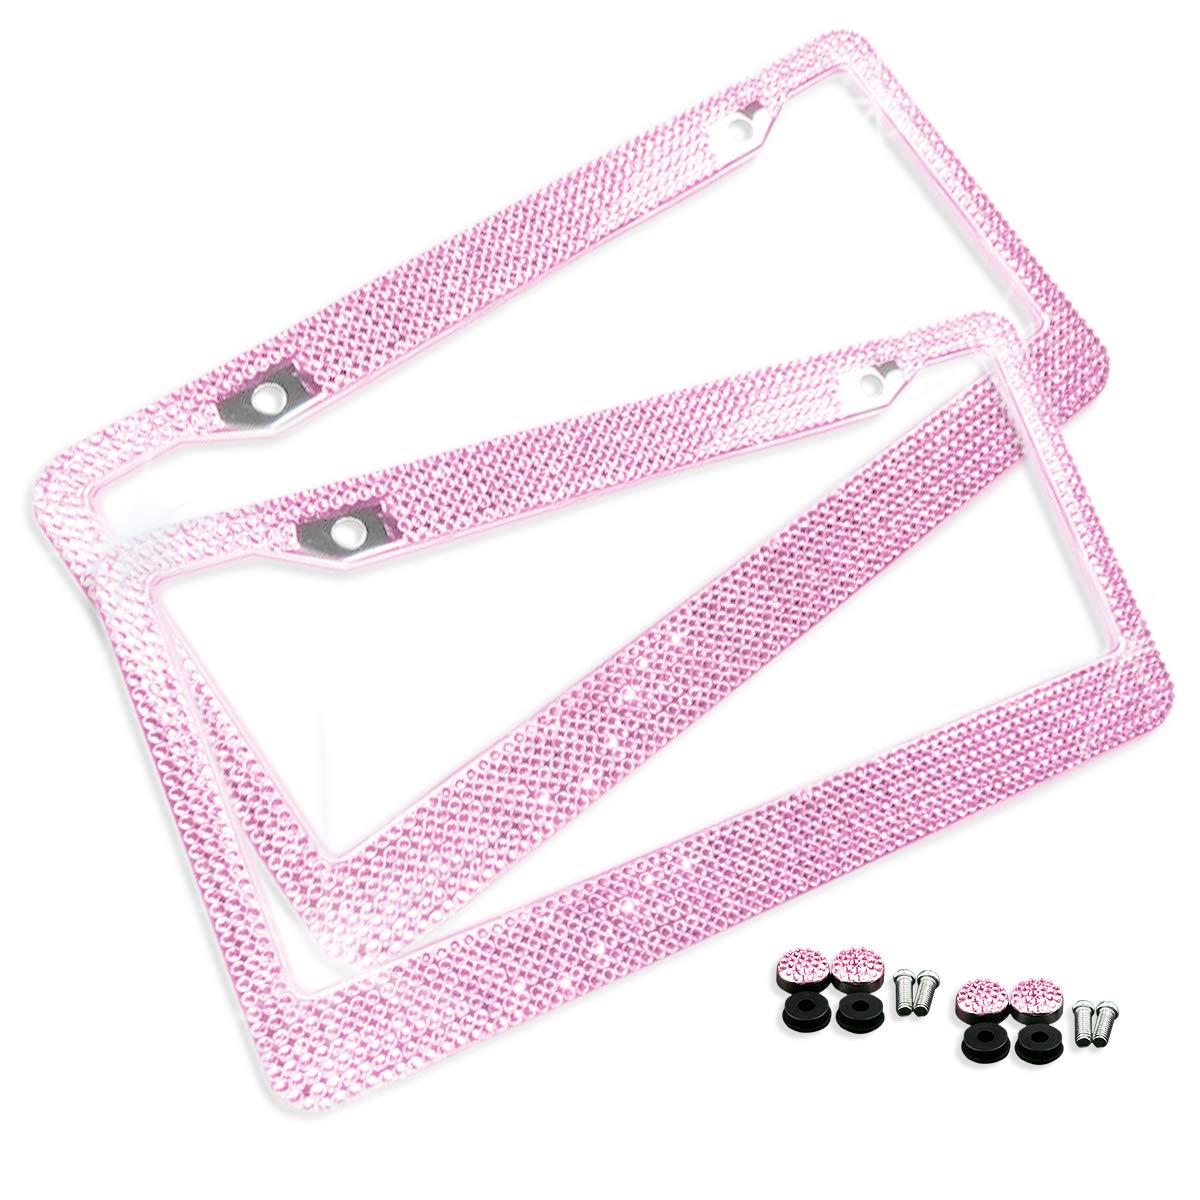 Qty 2 Pink Bling Glitter Crystal RhineStone License Plate Frame Car Truck Auto